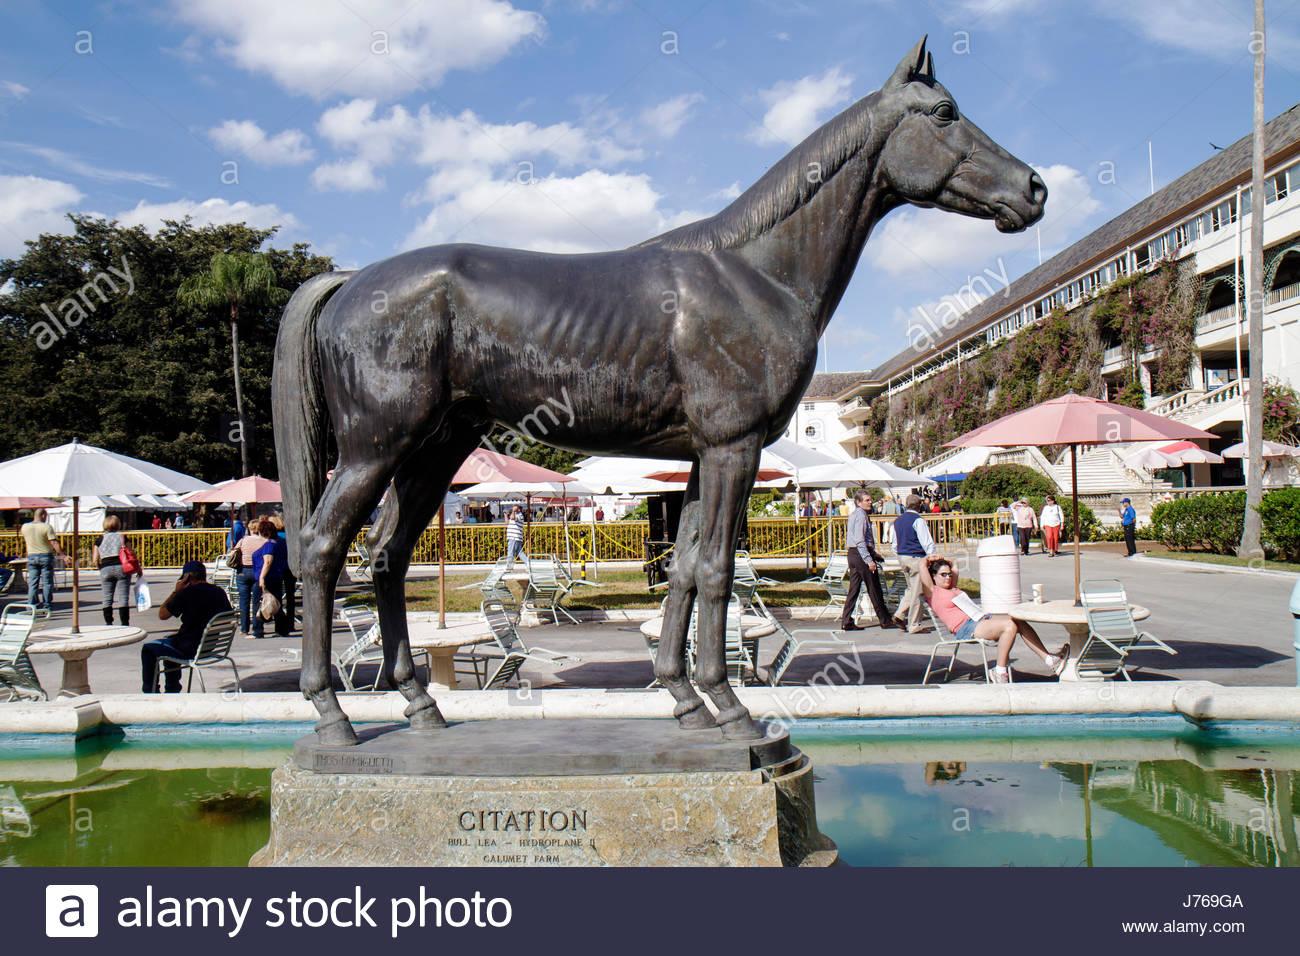 HialeahMiami Florida Hialeah Park quarter horse racing racetrack statue Citation - Stock Image